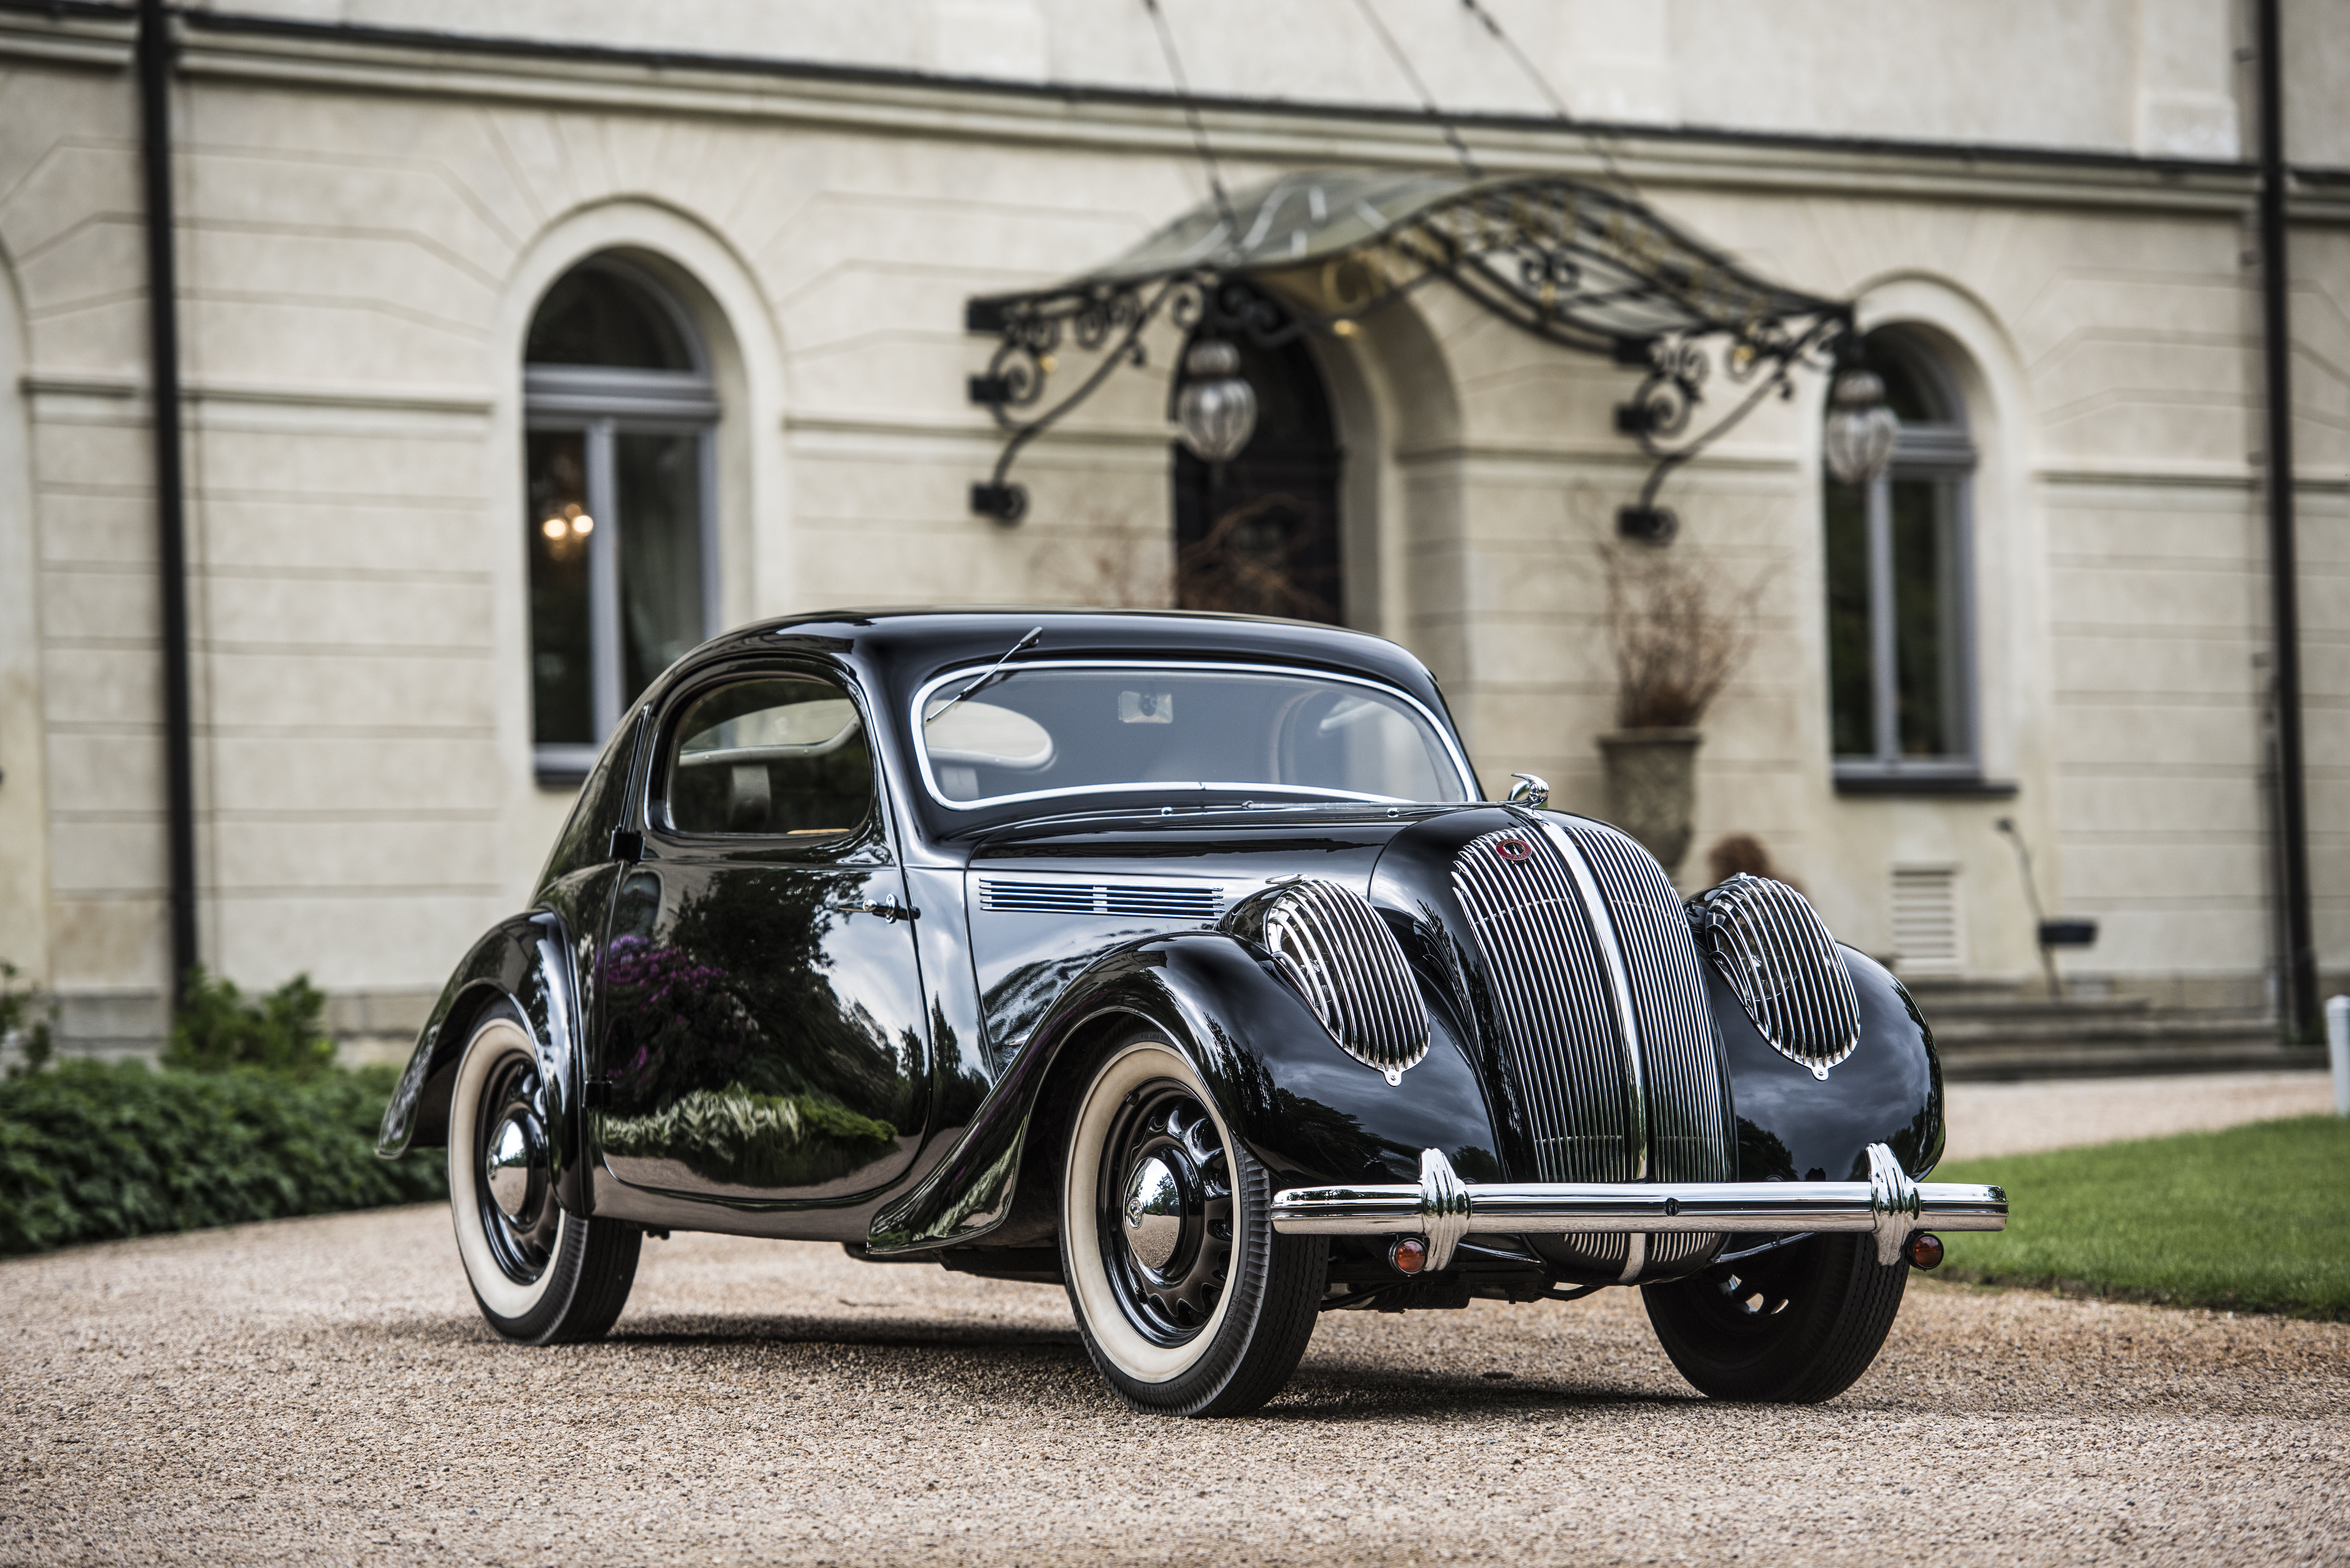 SKODA POPULAR Monte Carlo (1936–1939): The elegant model with rally DNA - Image 6